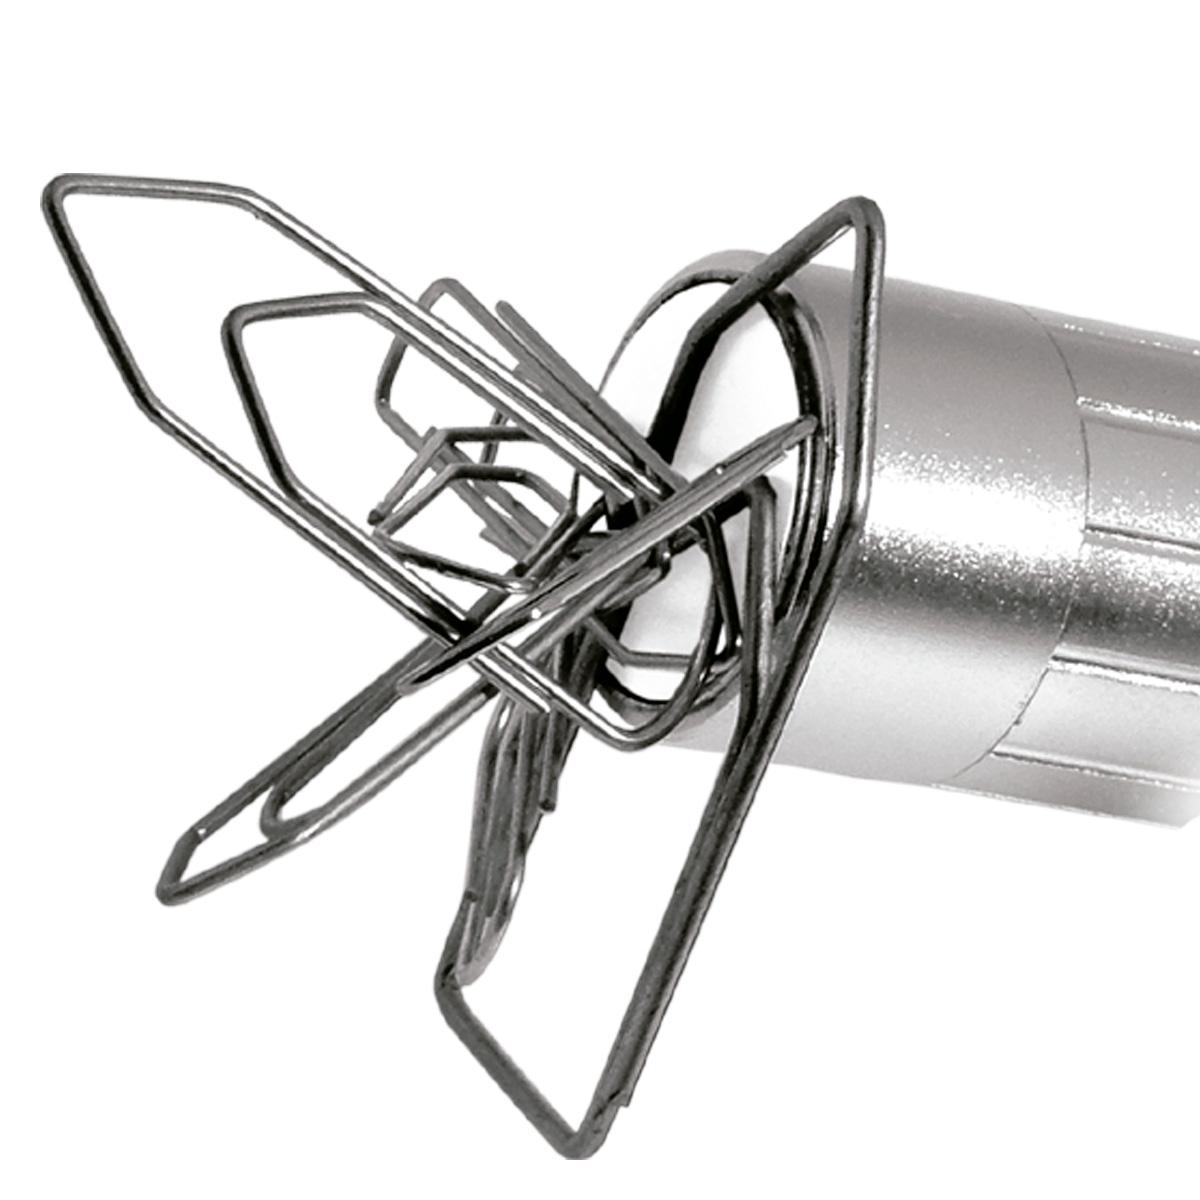 CSR8253 - Lanterna de Alumínio 7 + 24 LEDs CSR 8253 - CSR